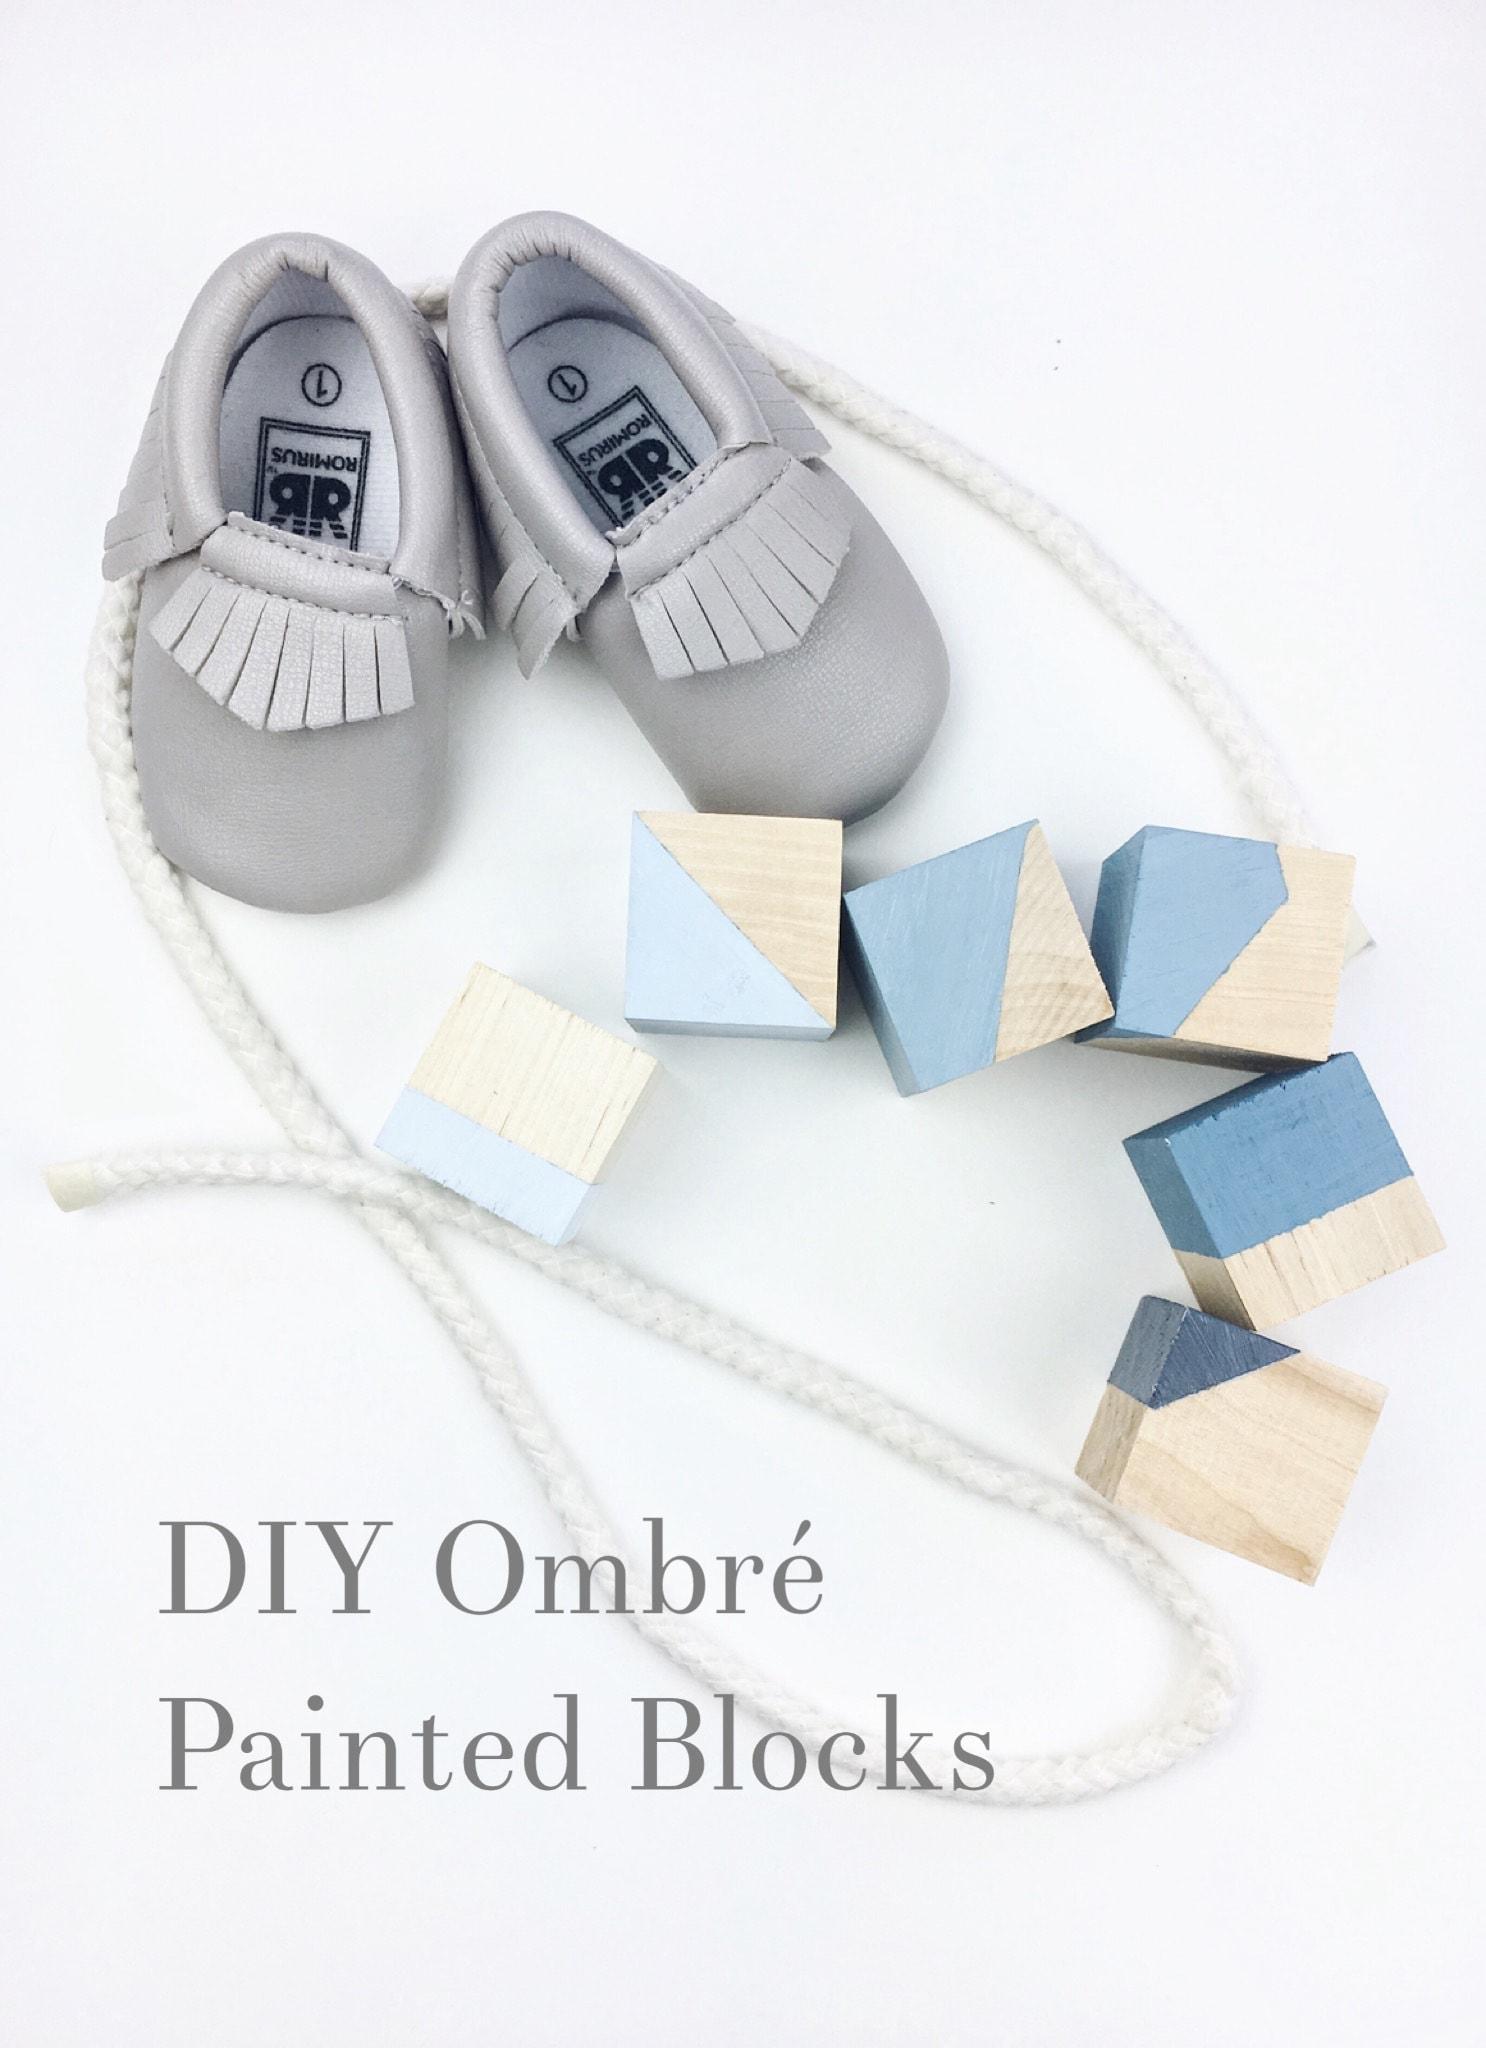 DIY Ombré Painted Blocks